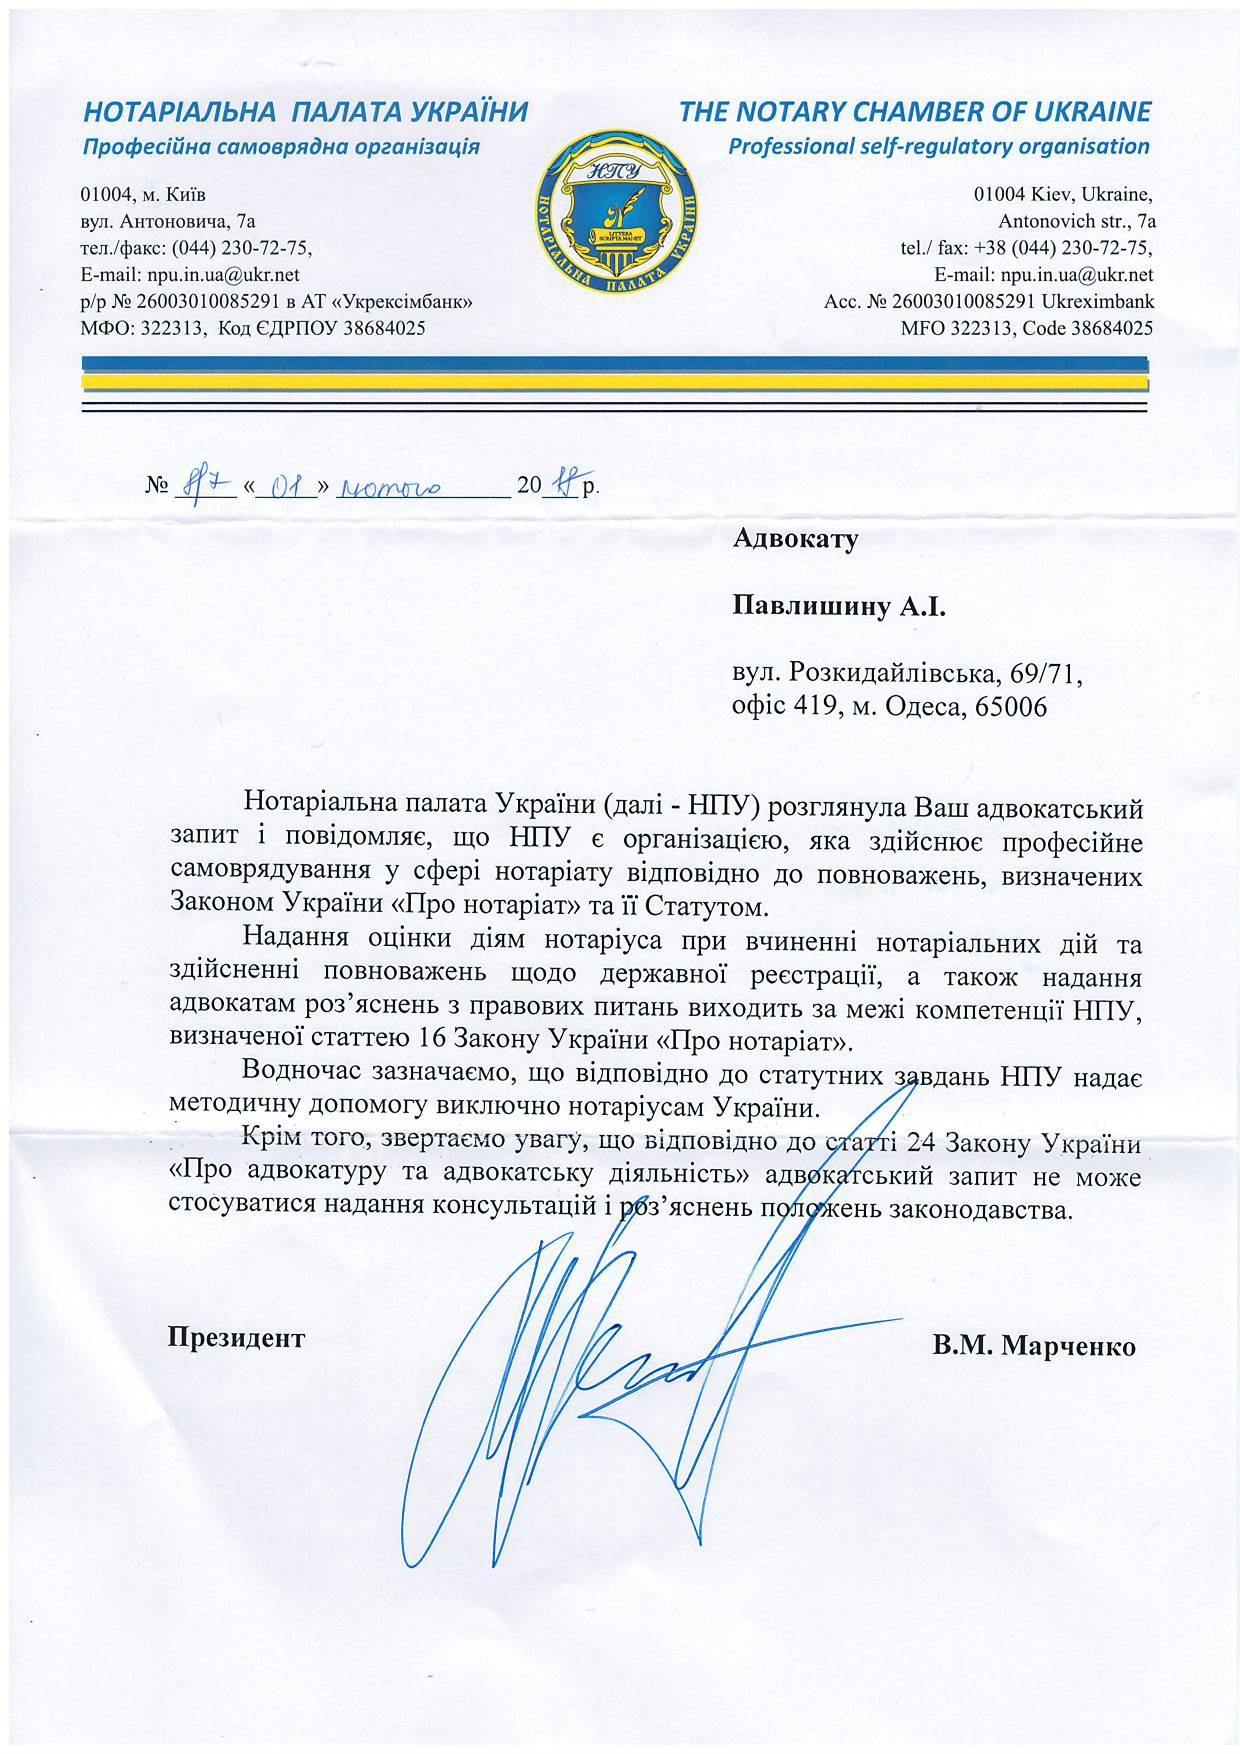 image http://forum.setam.net.ua/assets/images/79-Dd24VDMe7vAH9DuI.jpeg